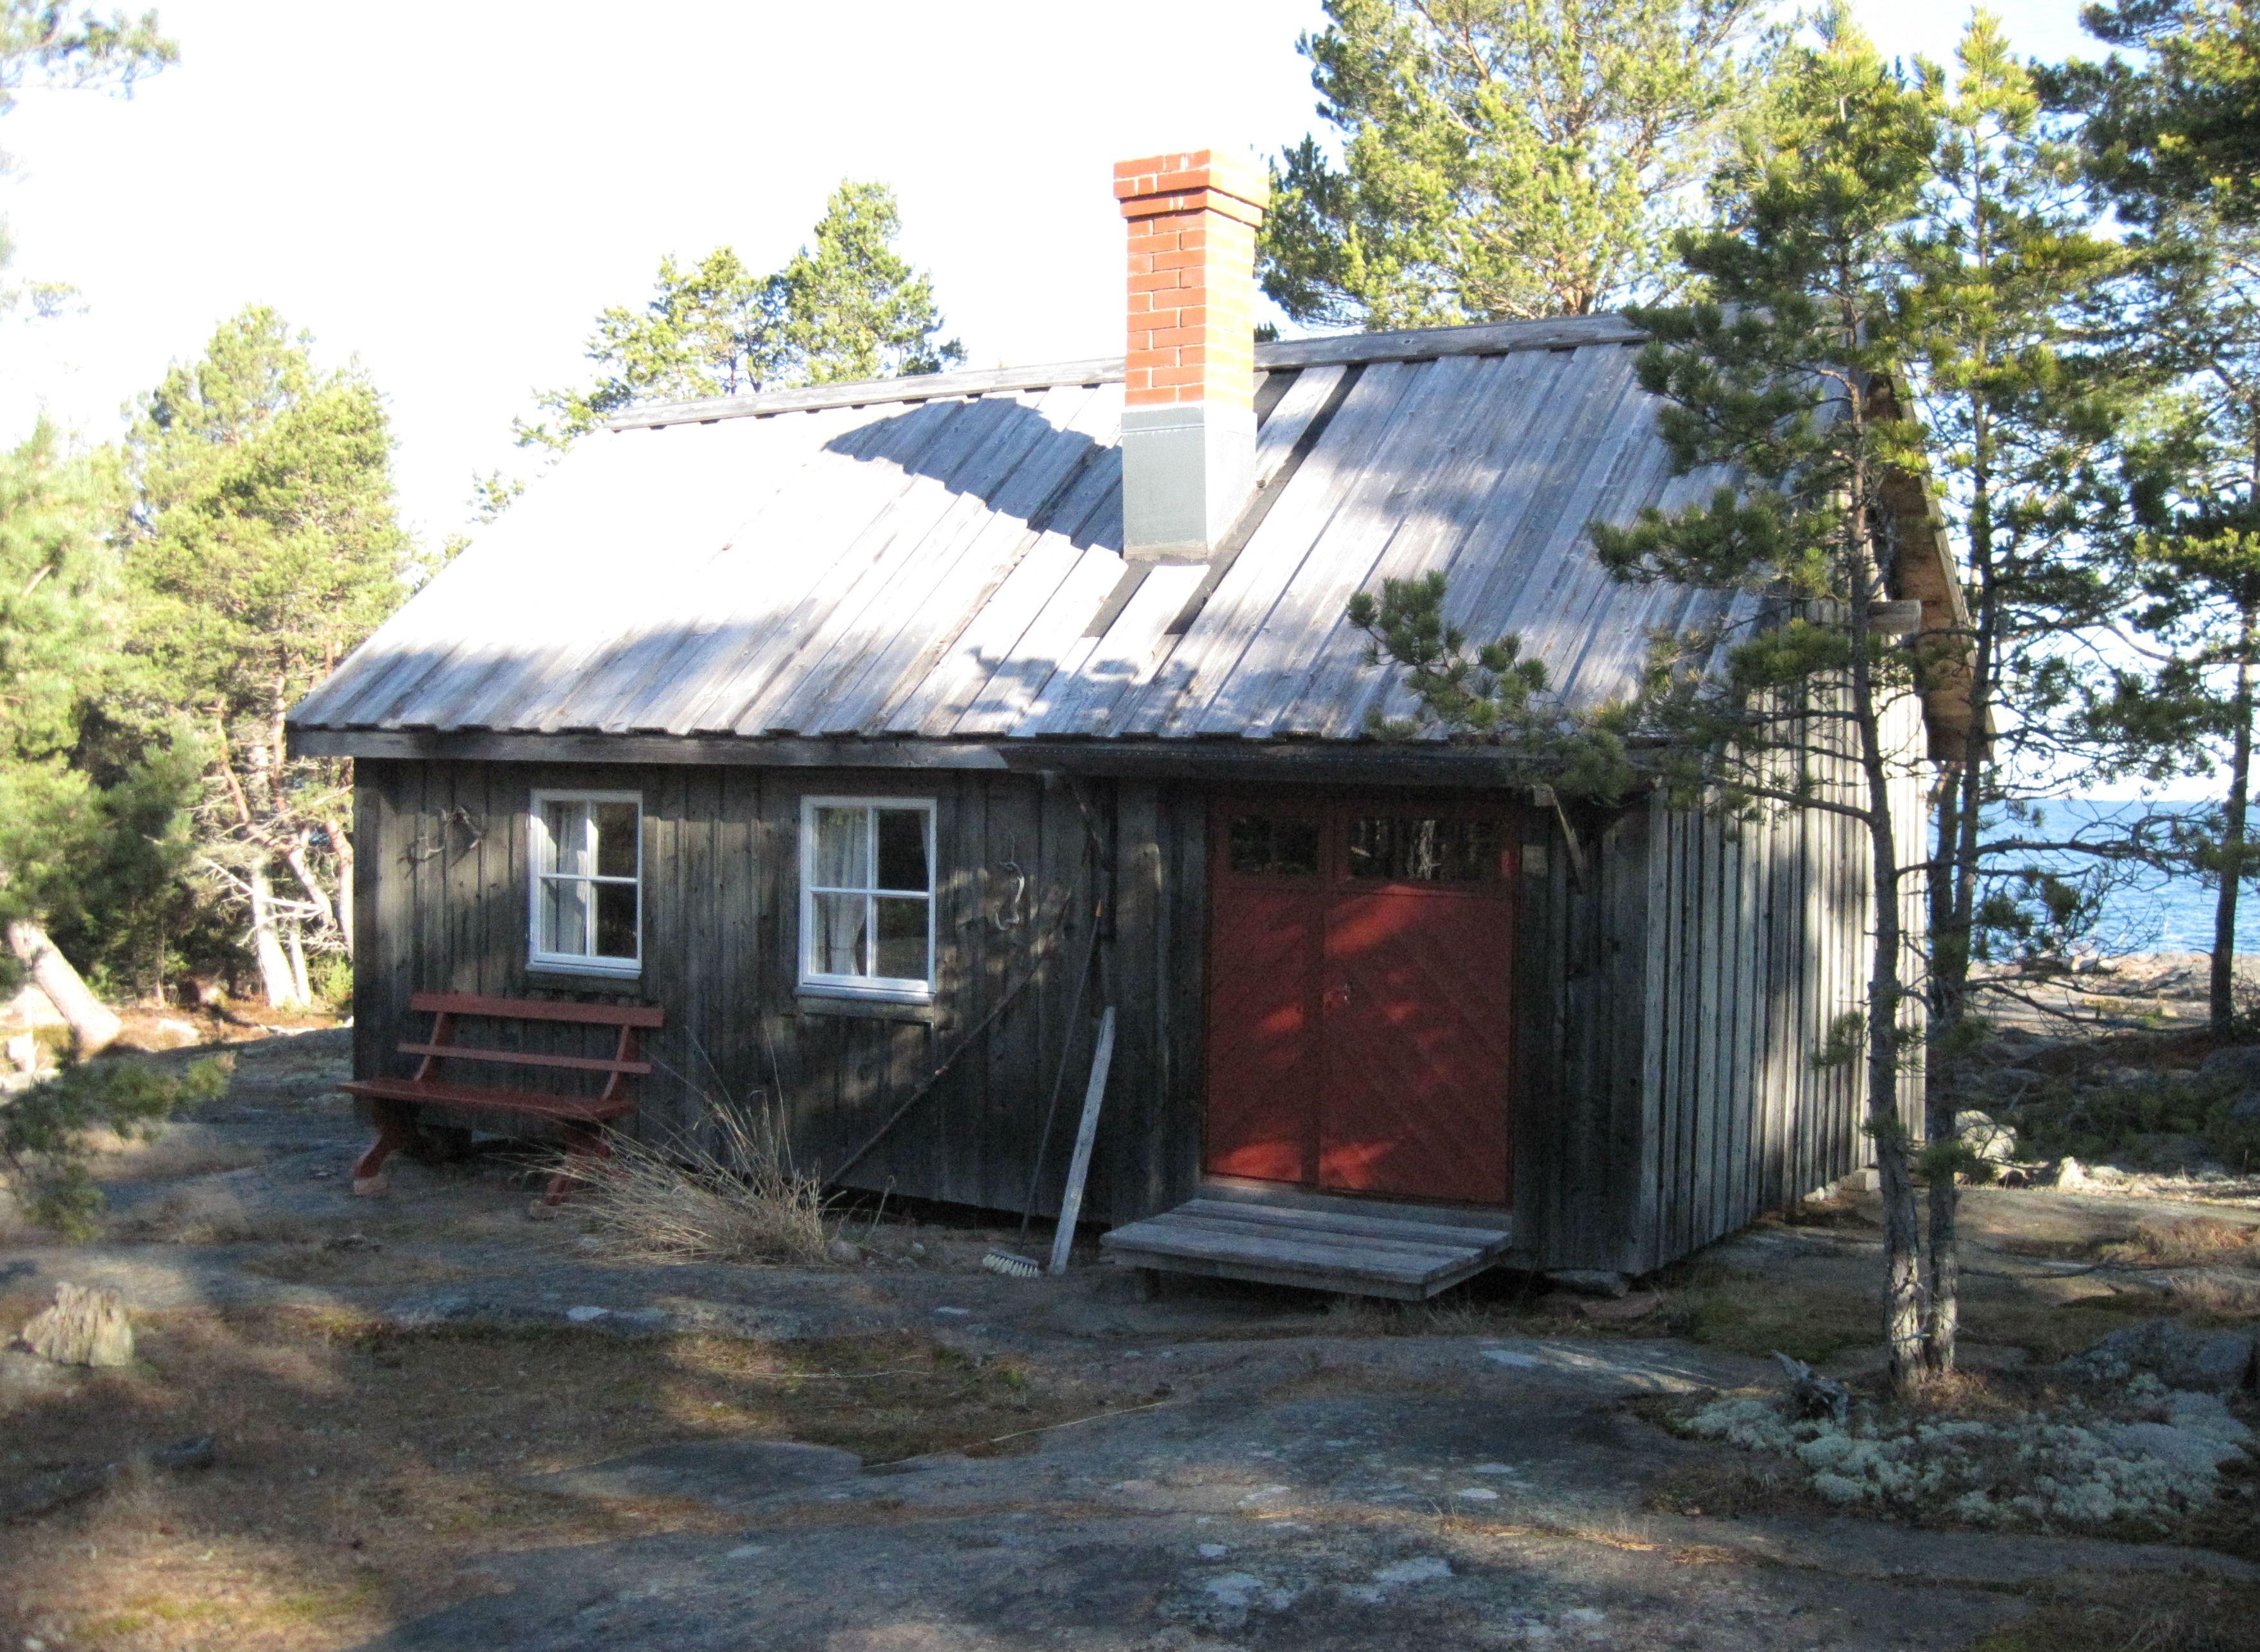 The Hermit Cottage on Sviskär Island, Silverskär